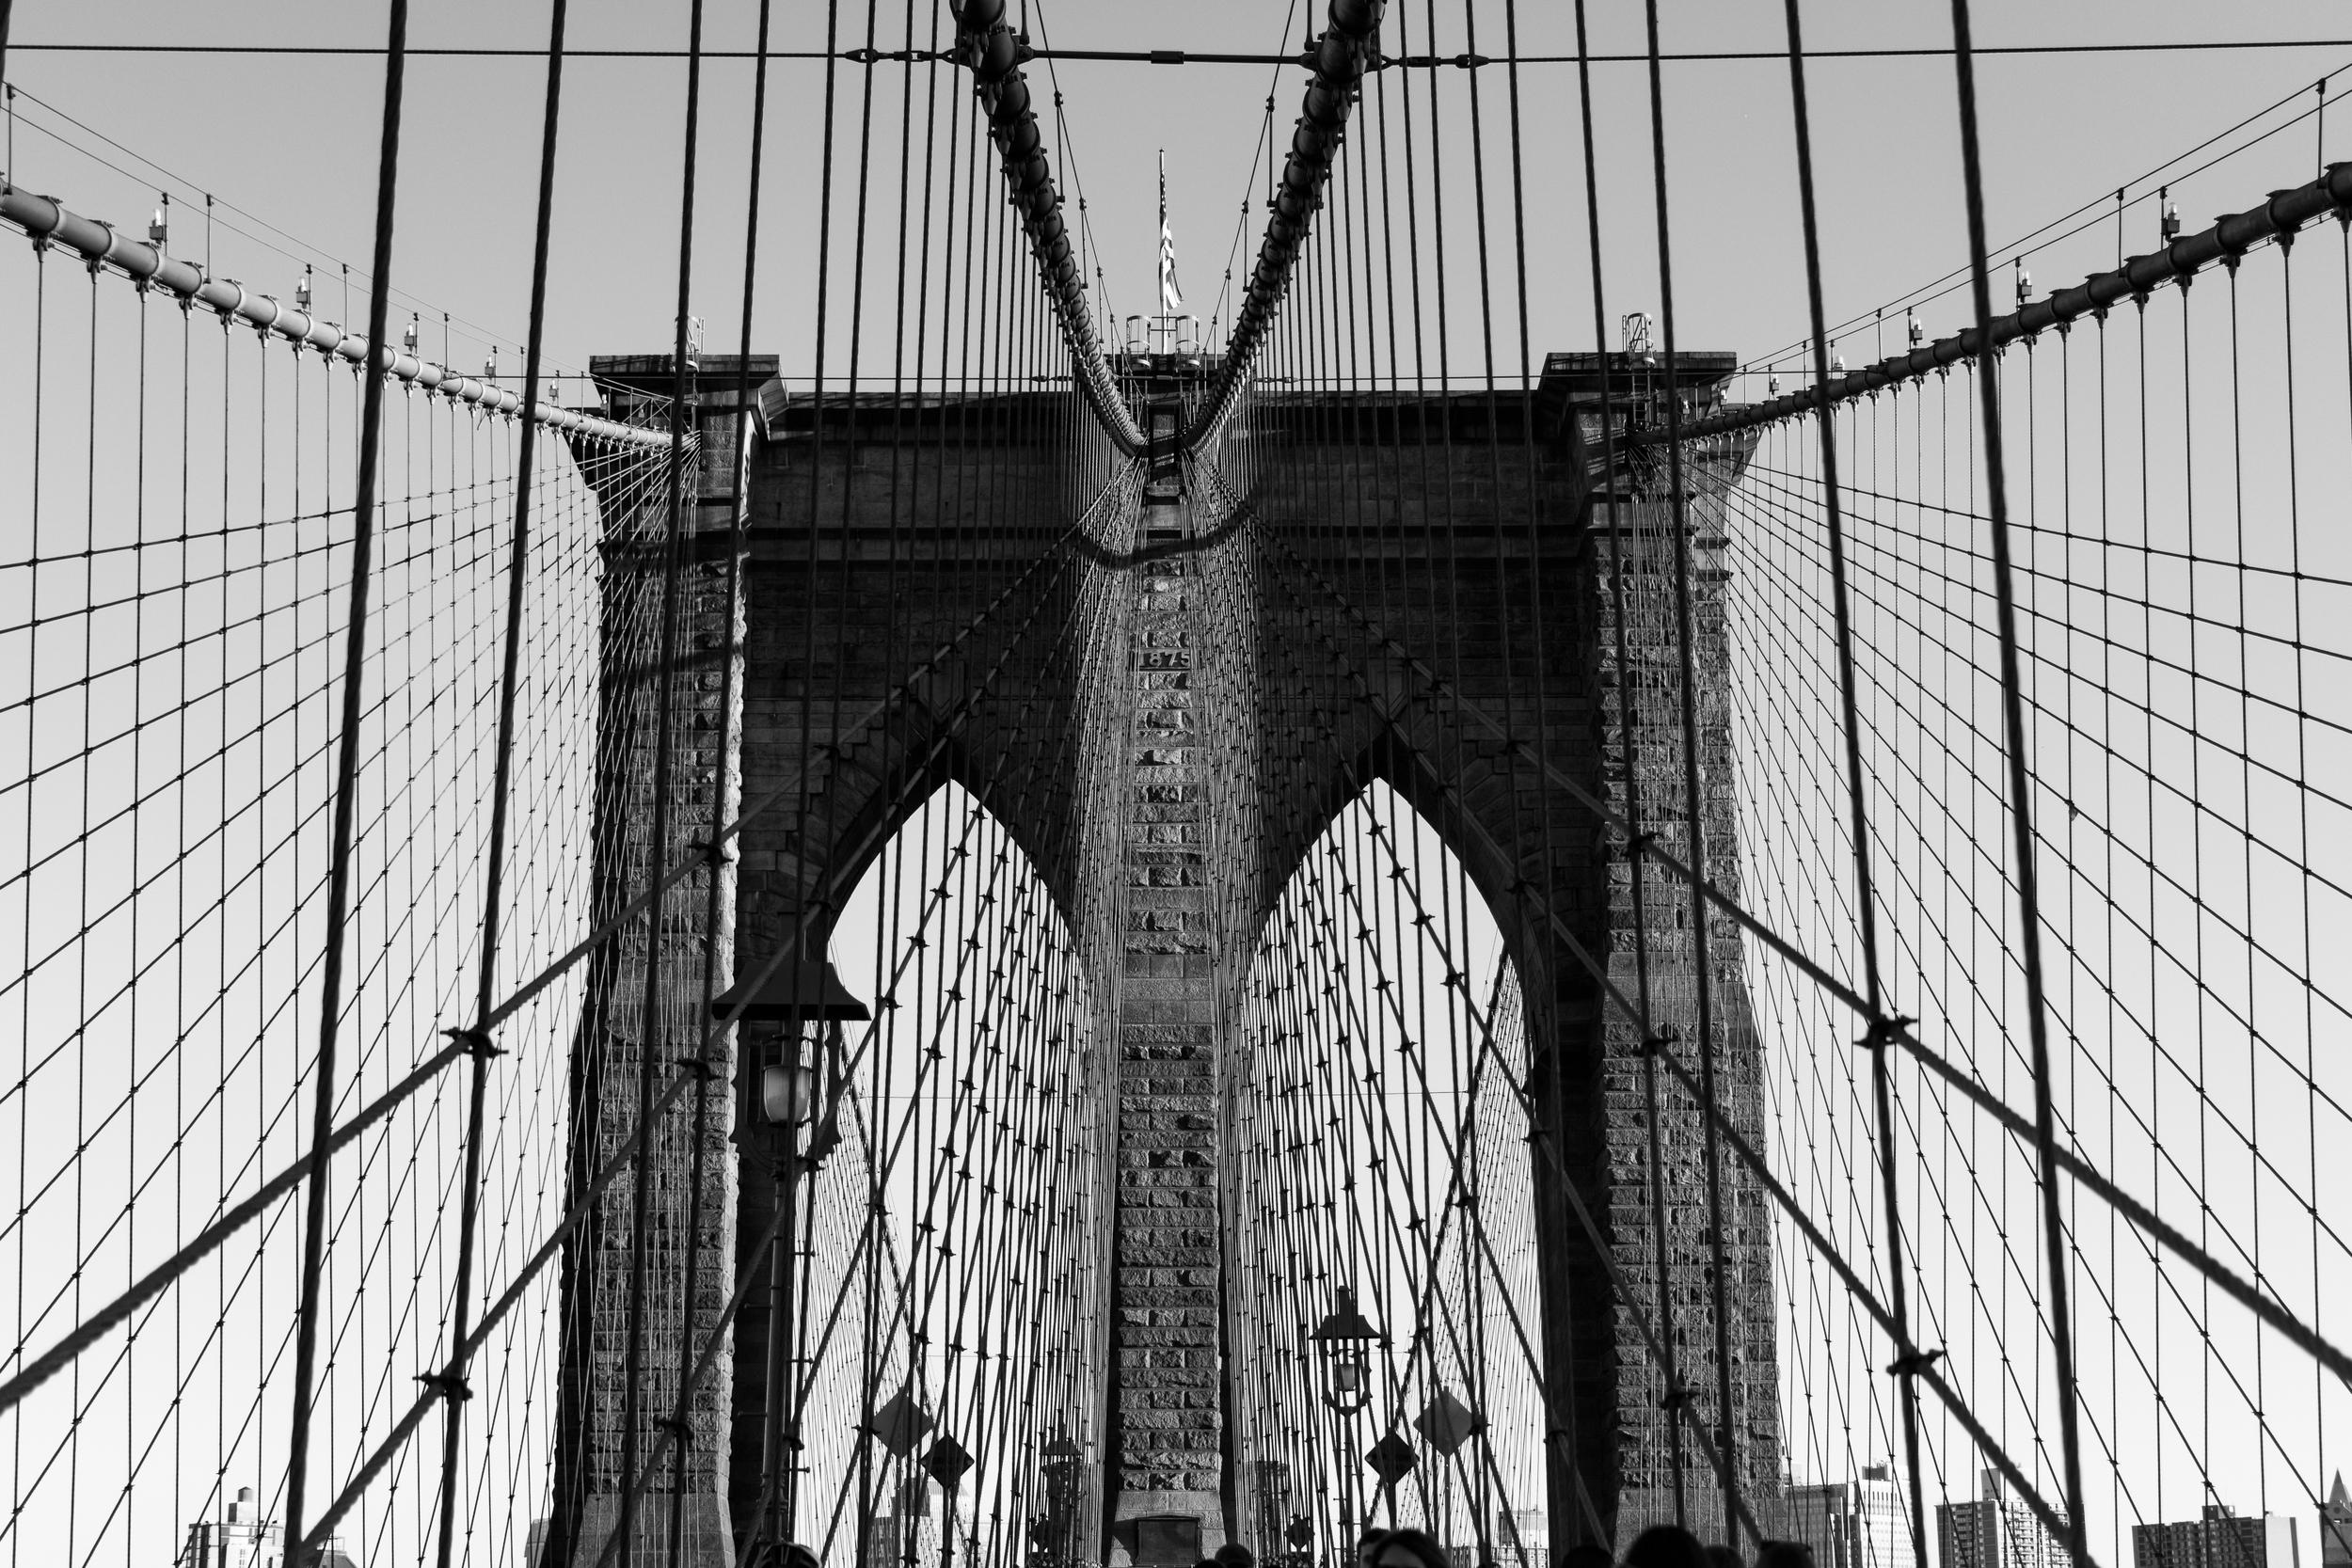 NYC_2015_028.jpg